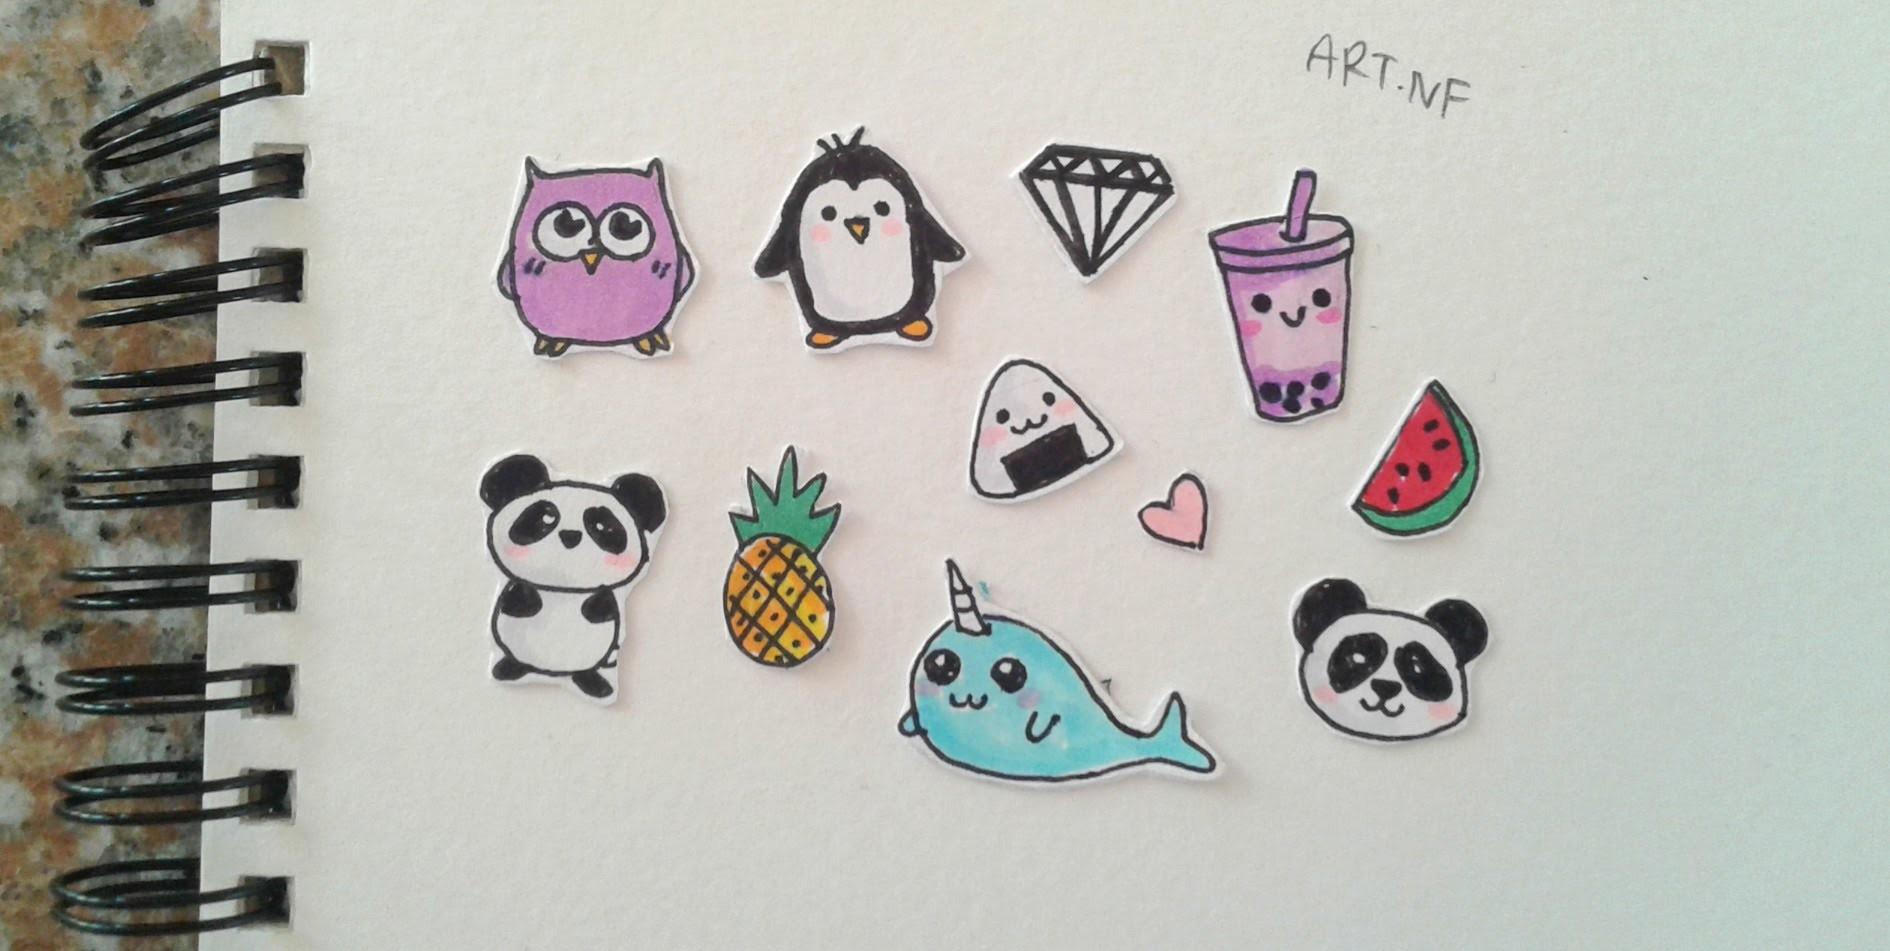 Diy Tumblr Stickers Drawings